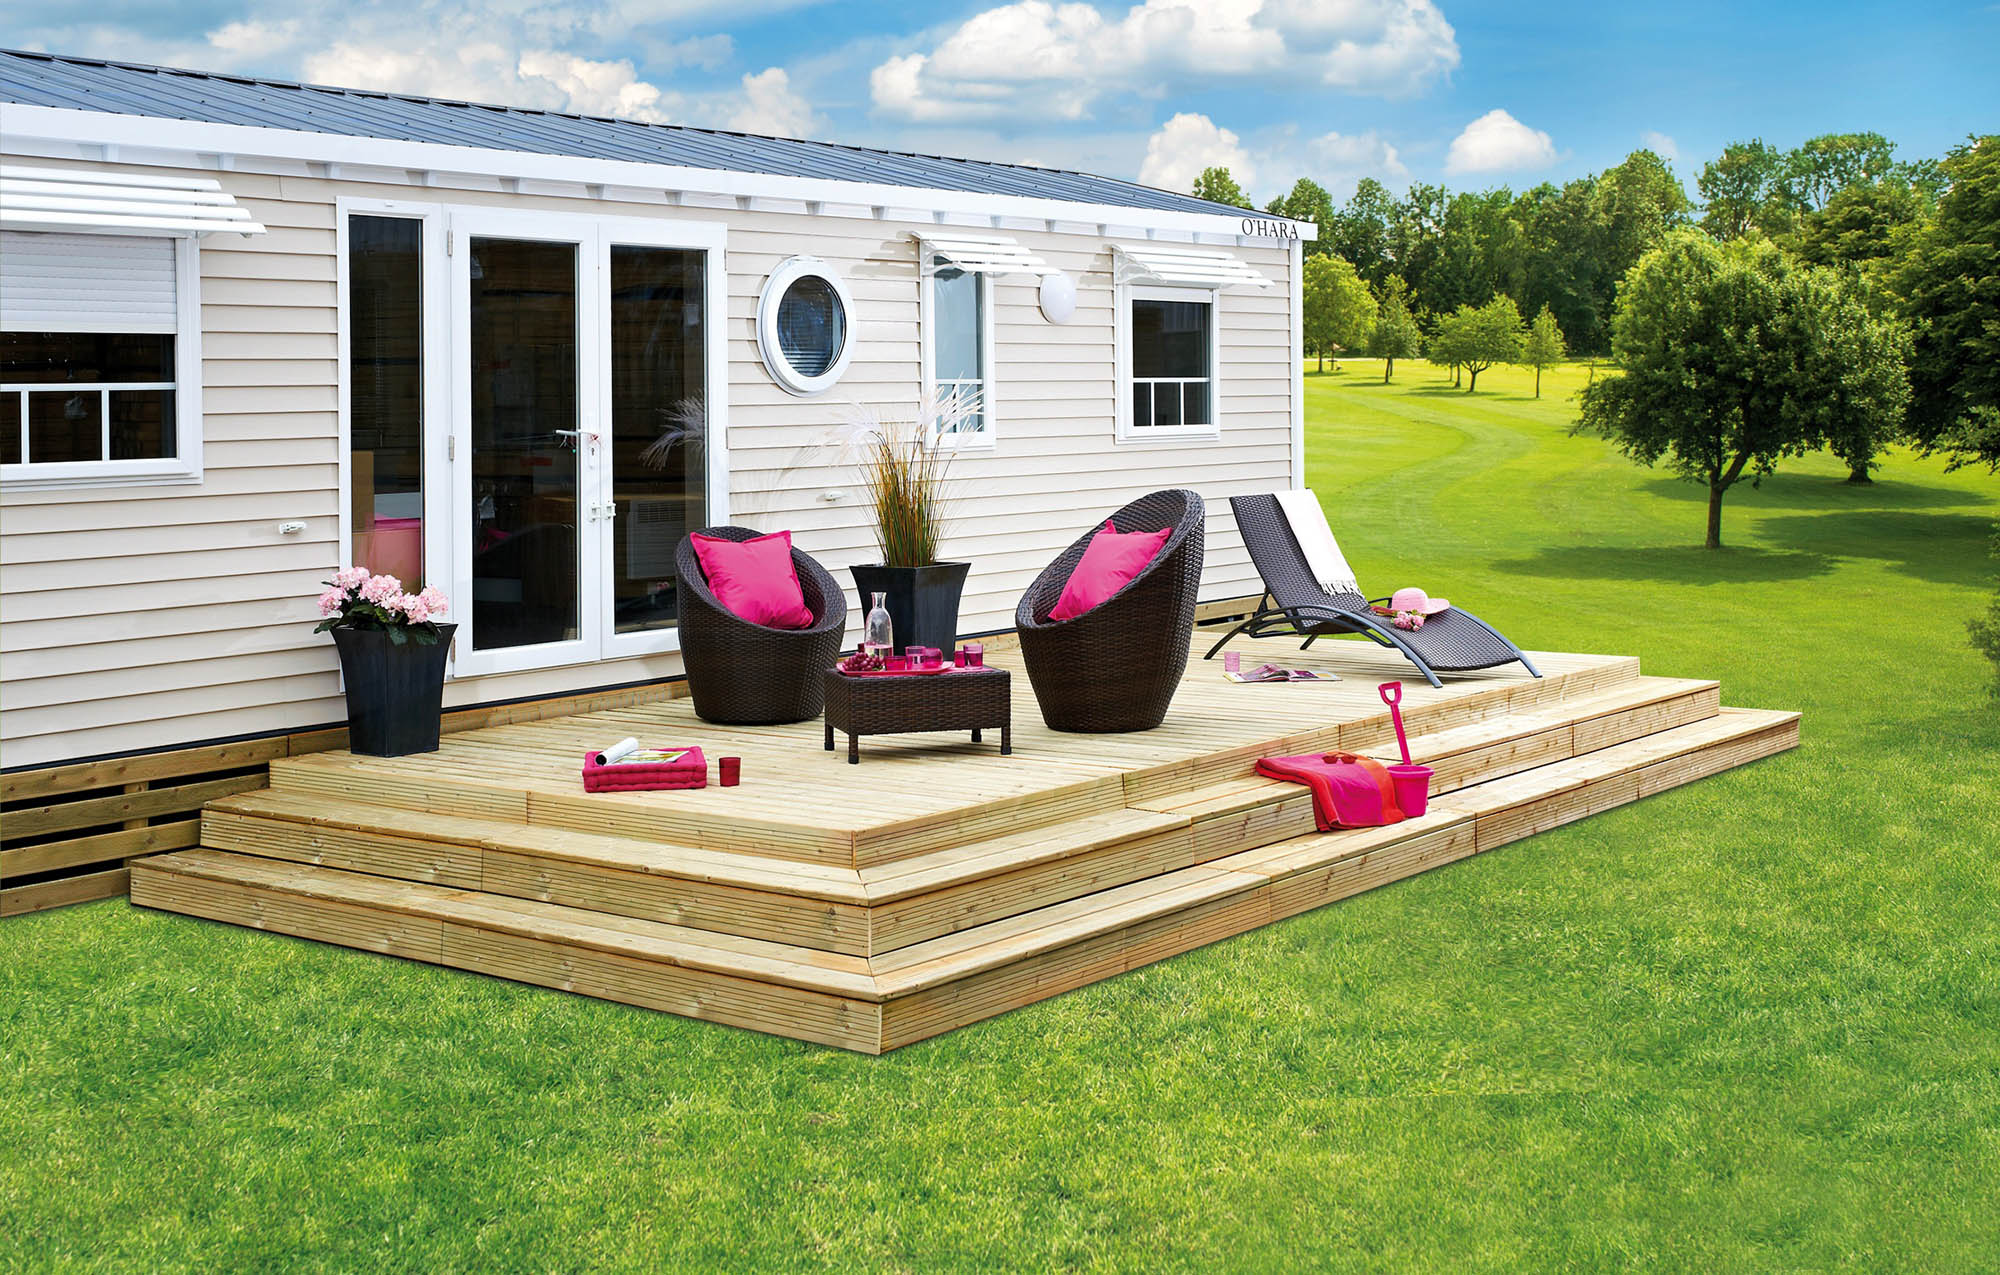 terrasse podium pour mobil home ibiza lattes. Black Bedroom Furniture Sets. Home Design Ideas